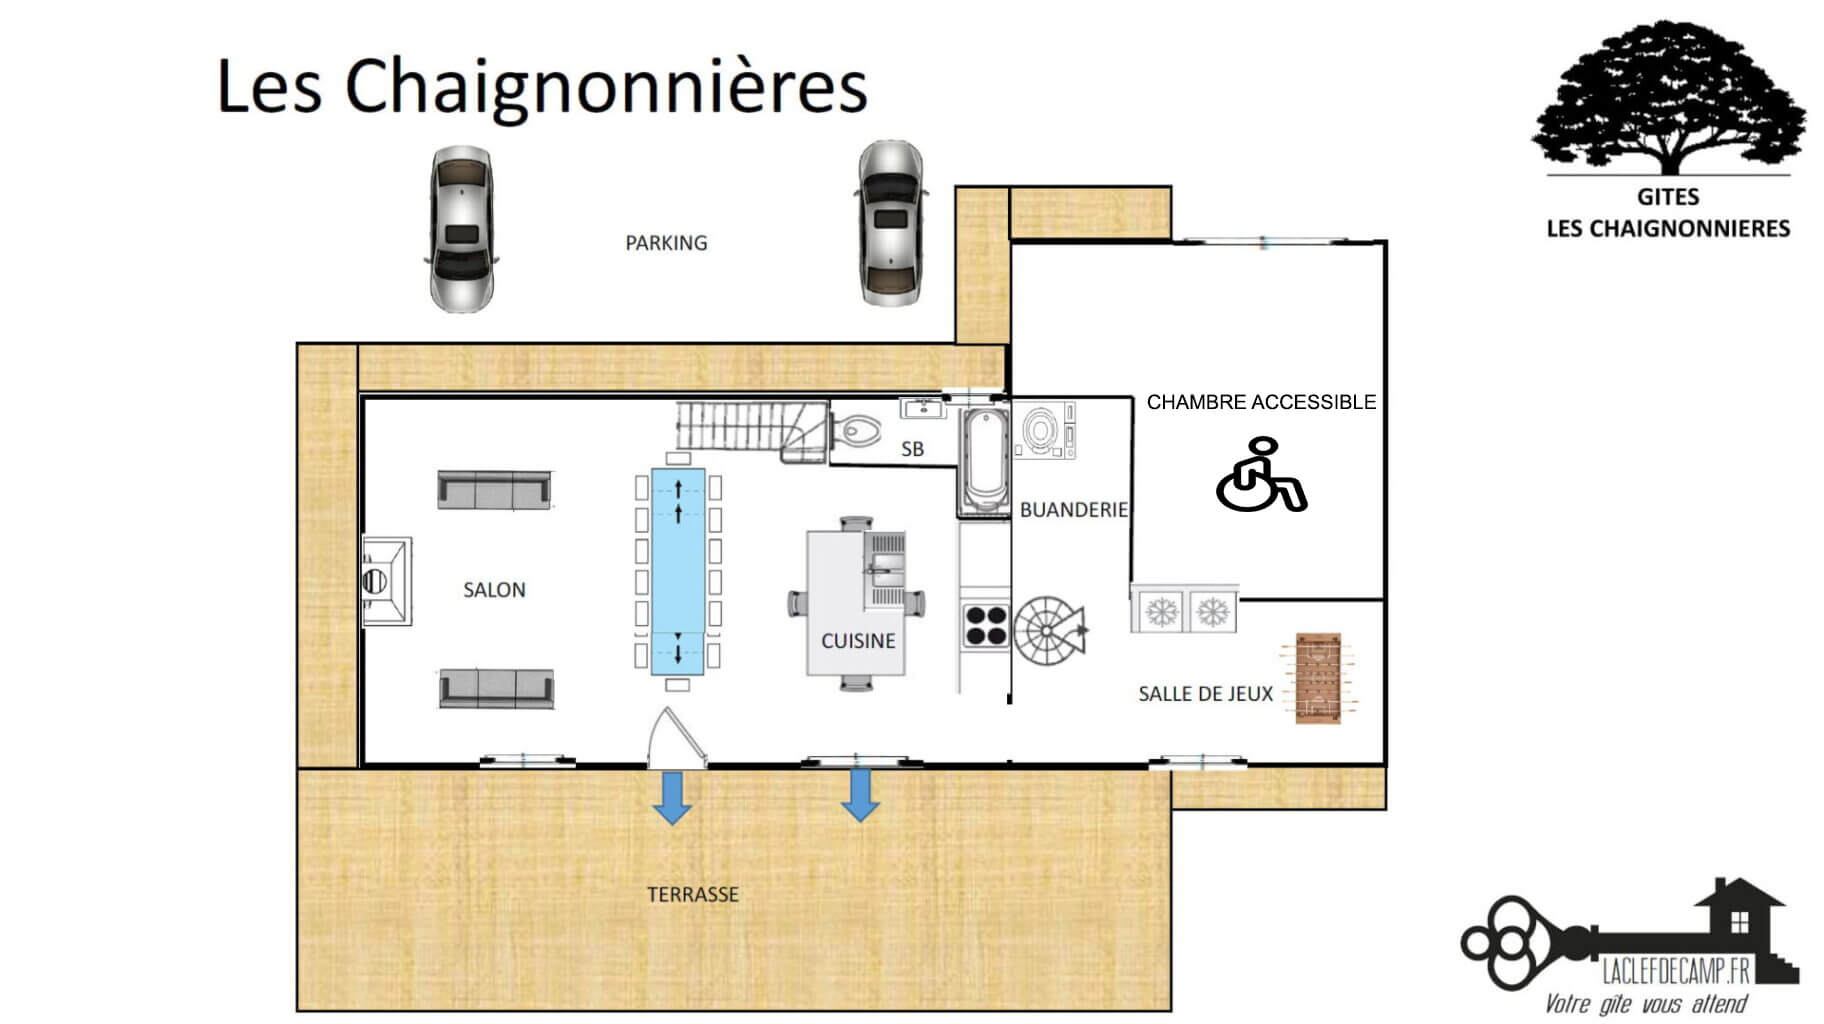 Les-chaignonnieres-plan RDC2 (1)